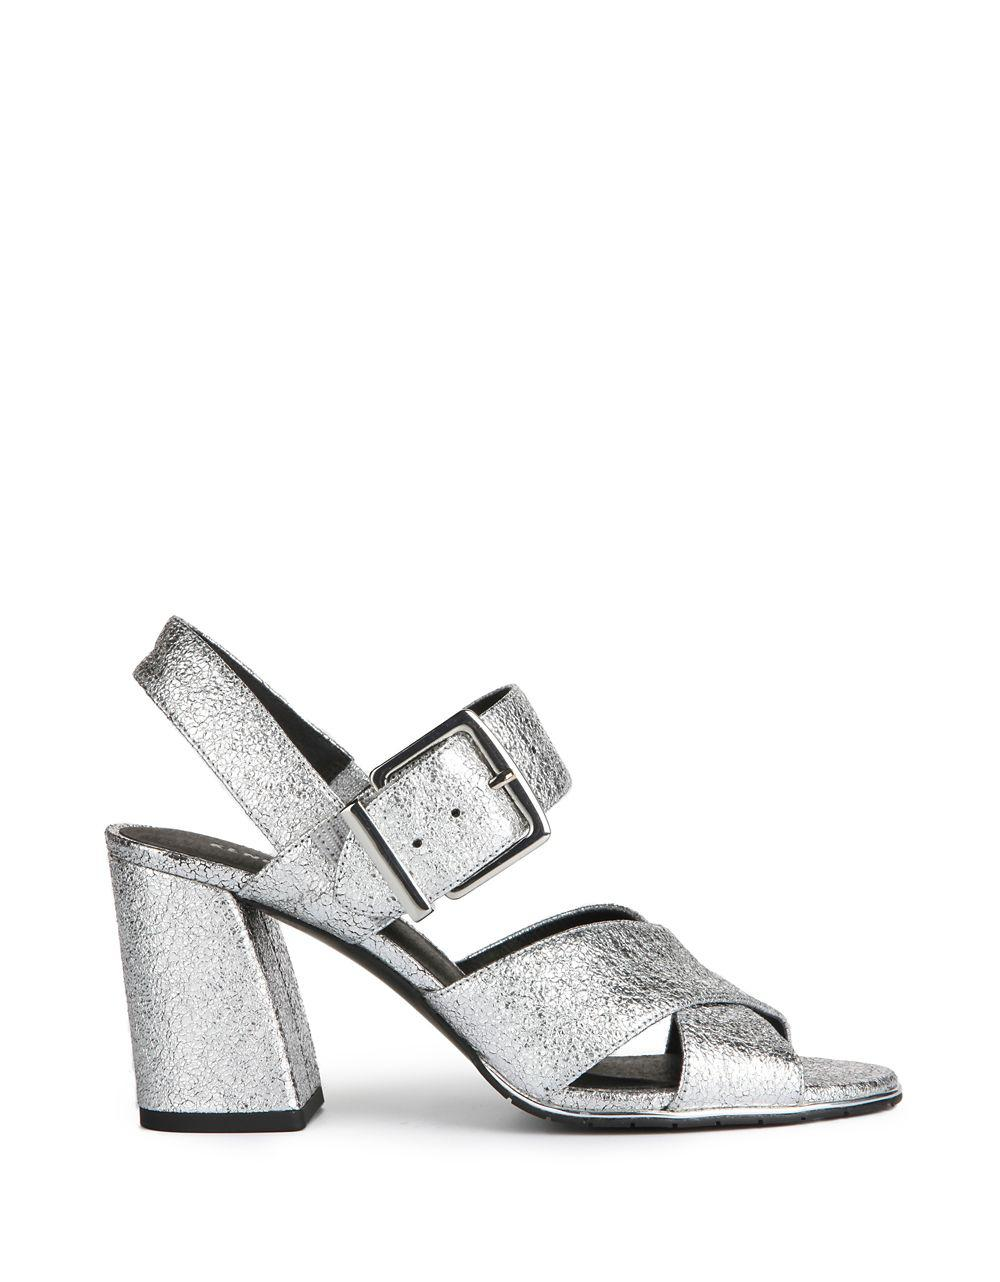 978399c0c2a Kenneth Cole Lauralynn Leather Sandals - Lyst